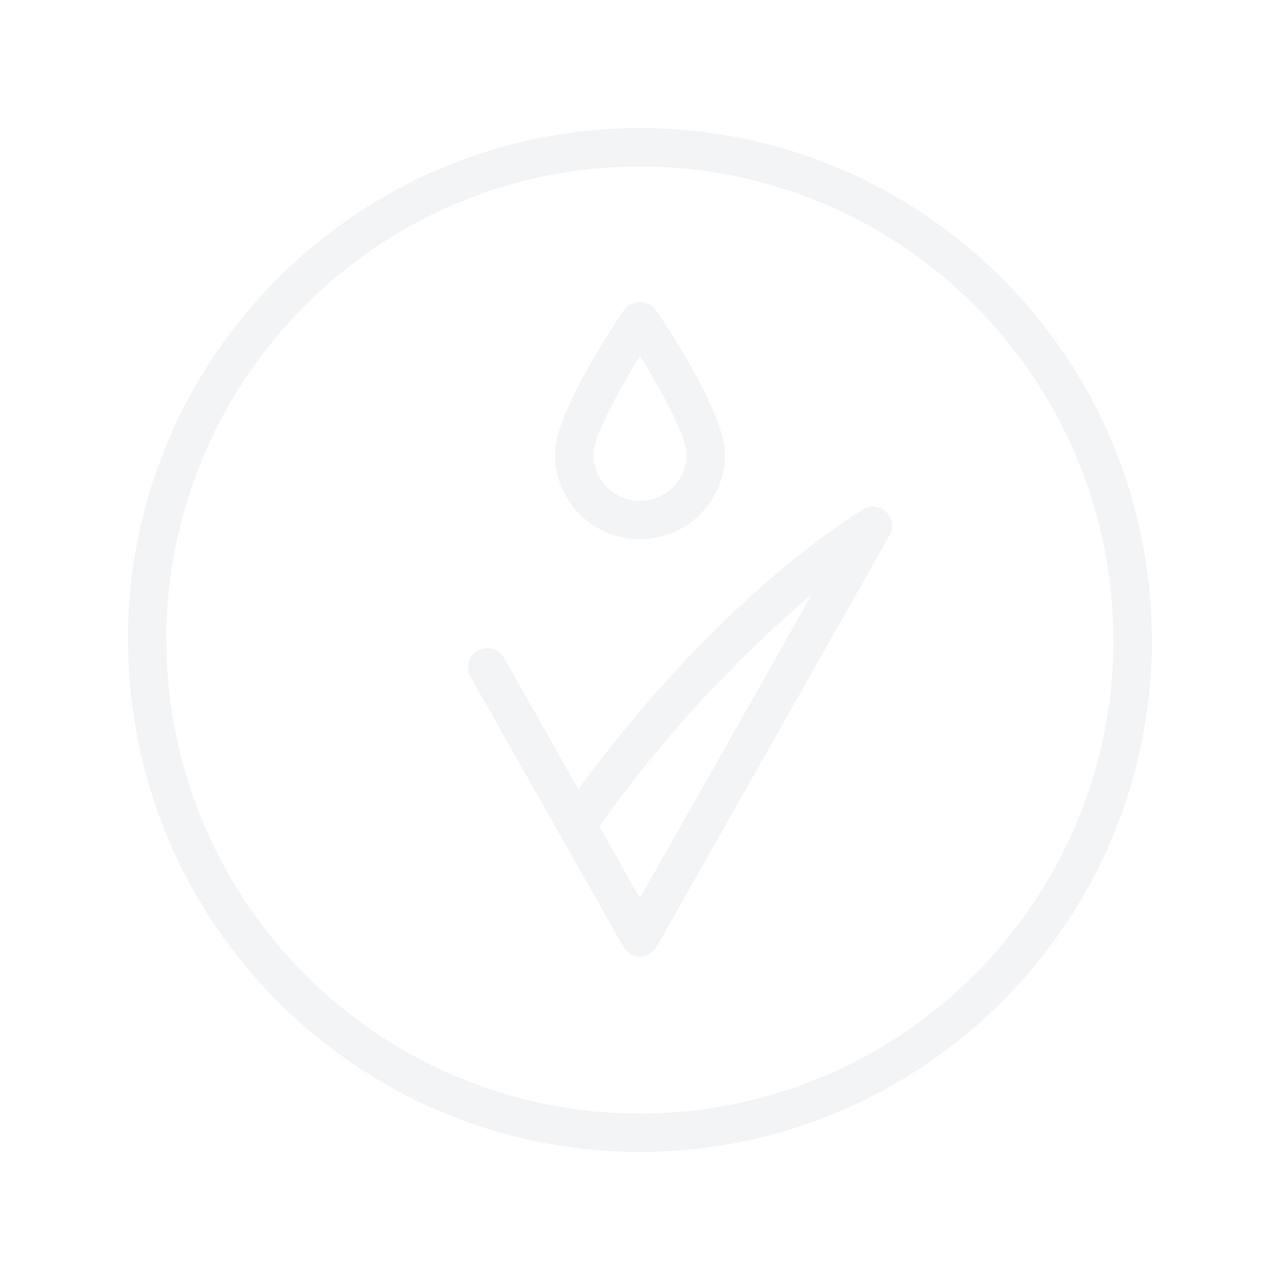 UNITE 7Seconds Mask